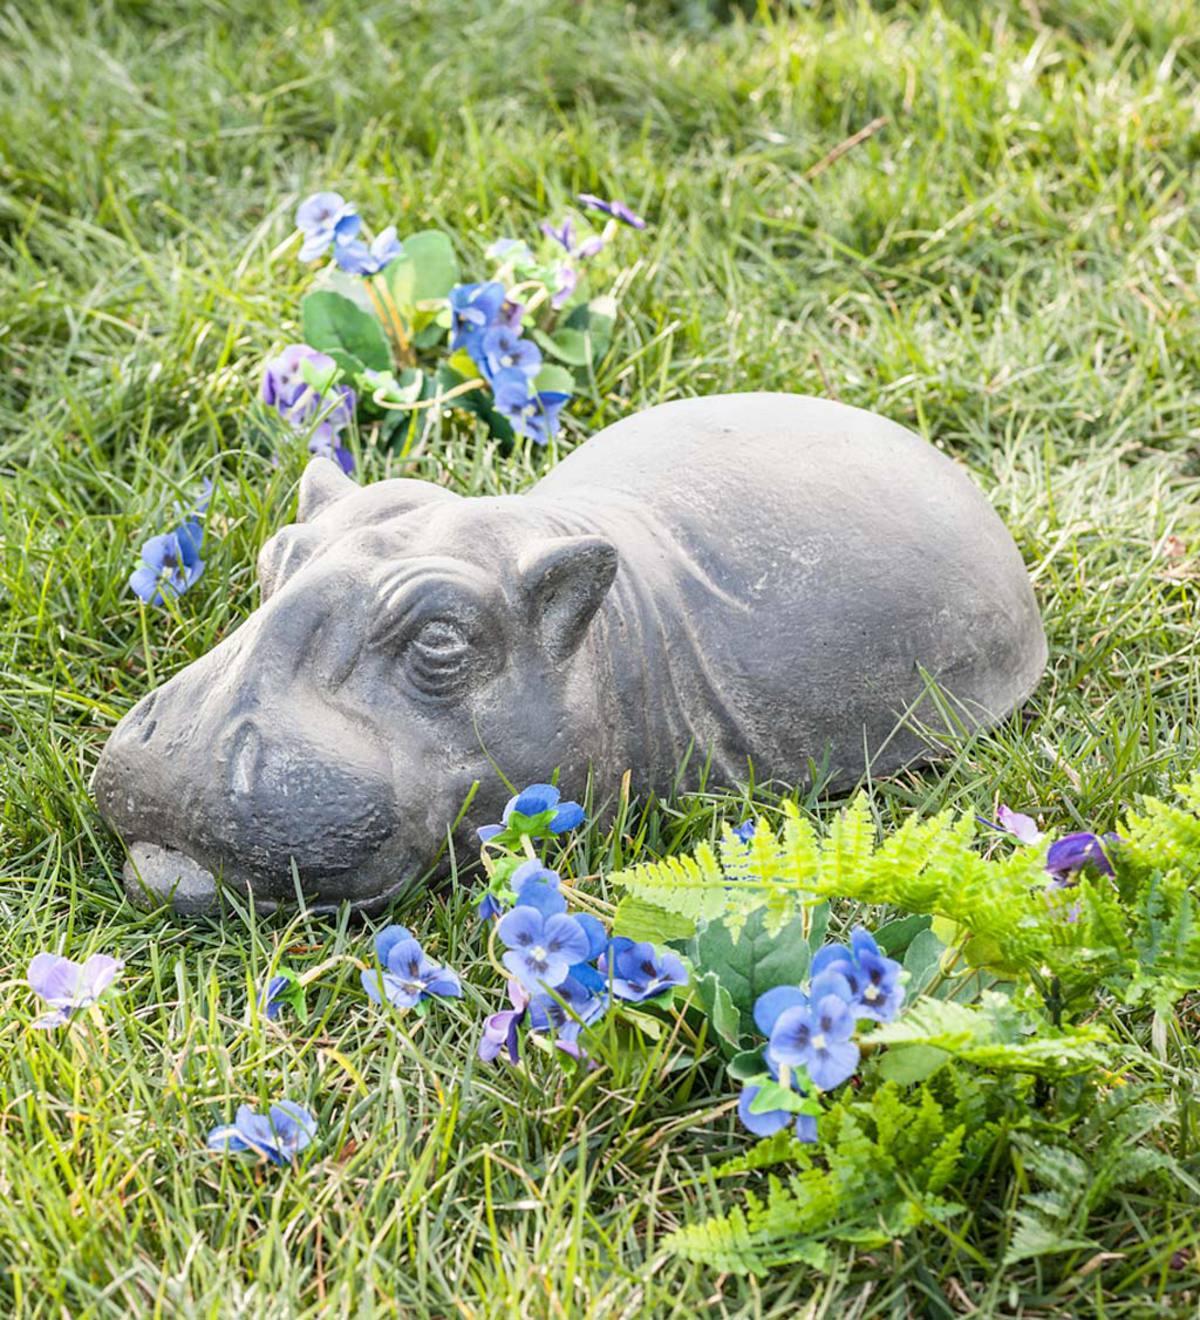 Garden Art Sculpture: Baby Garden Hippo Sculpture